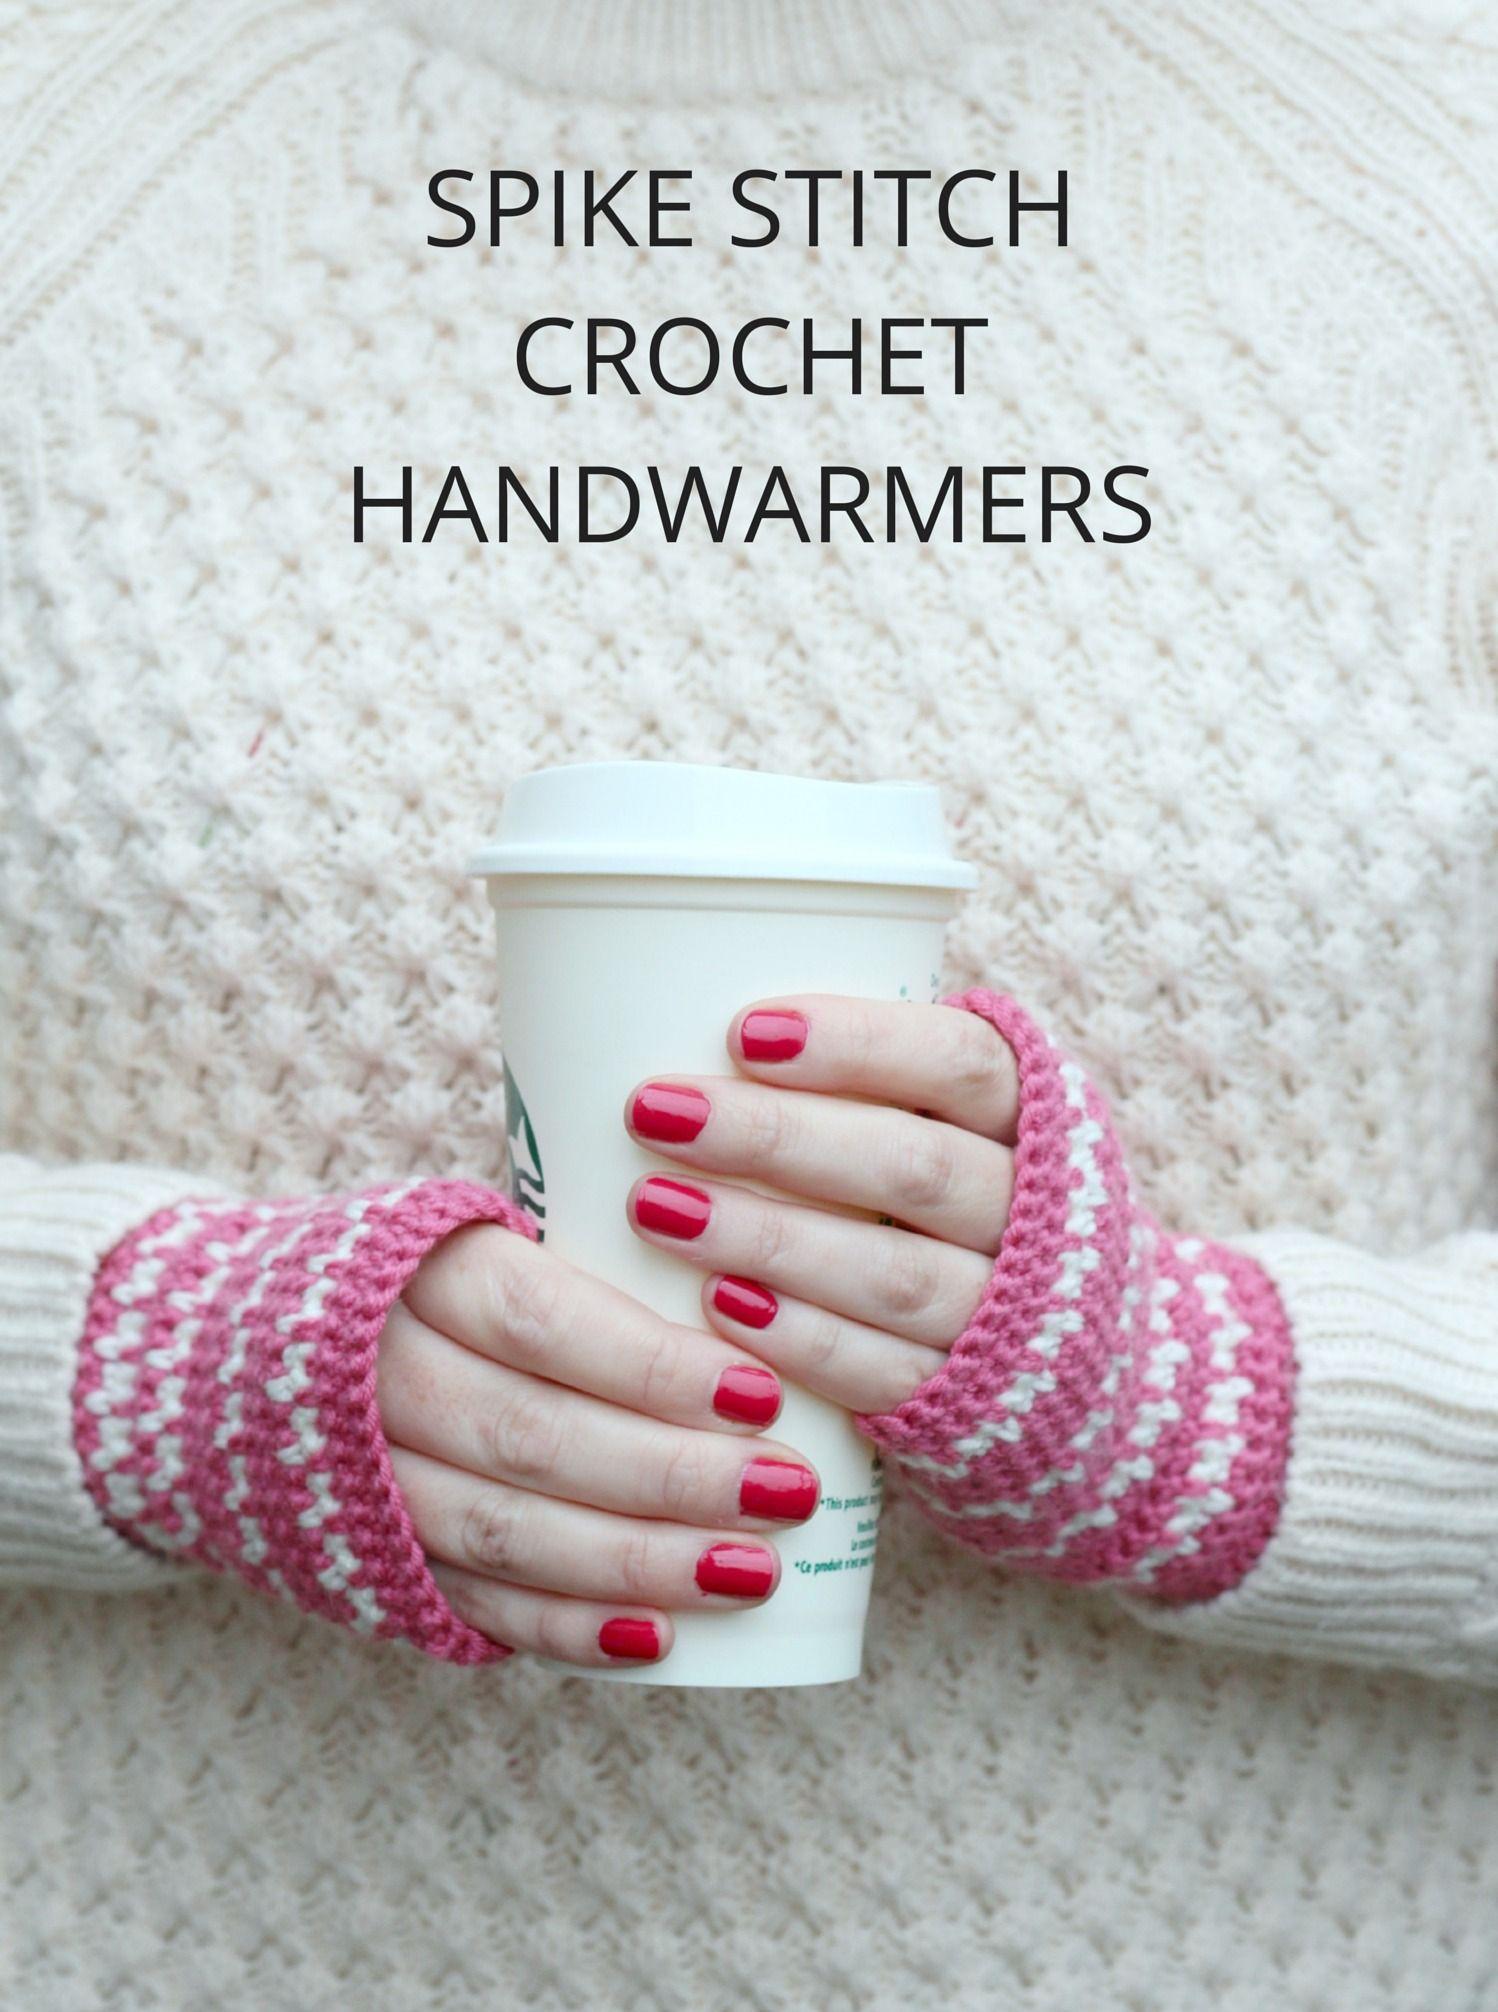 Spike stitch crochet handwarmers   Hooks and needles   Pinterest ...